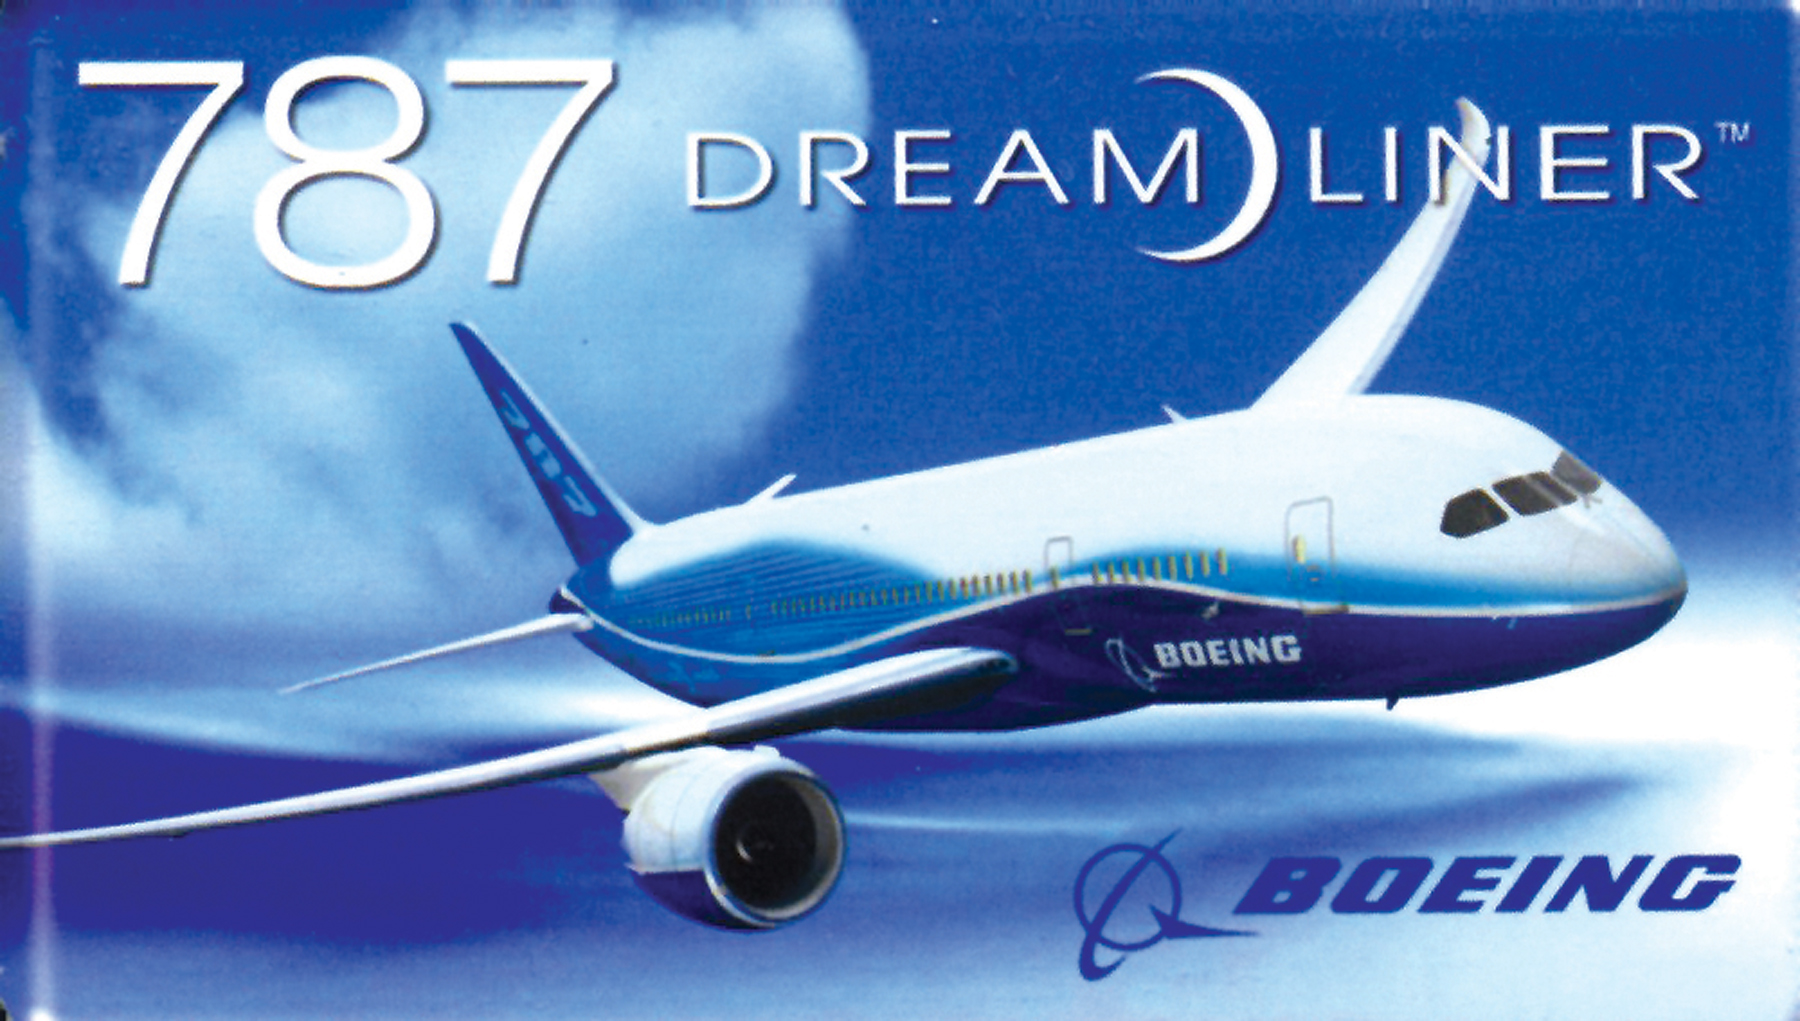 Boeing 787 Dreamliner Details Unveiled